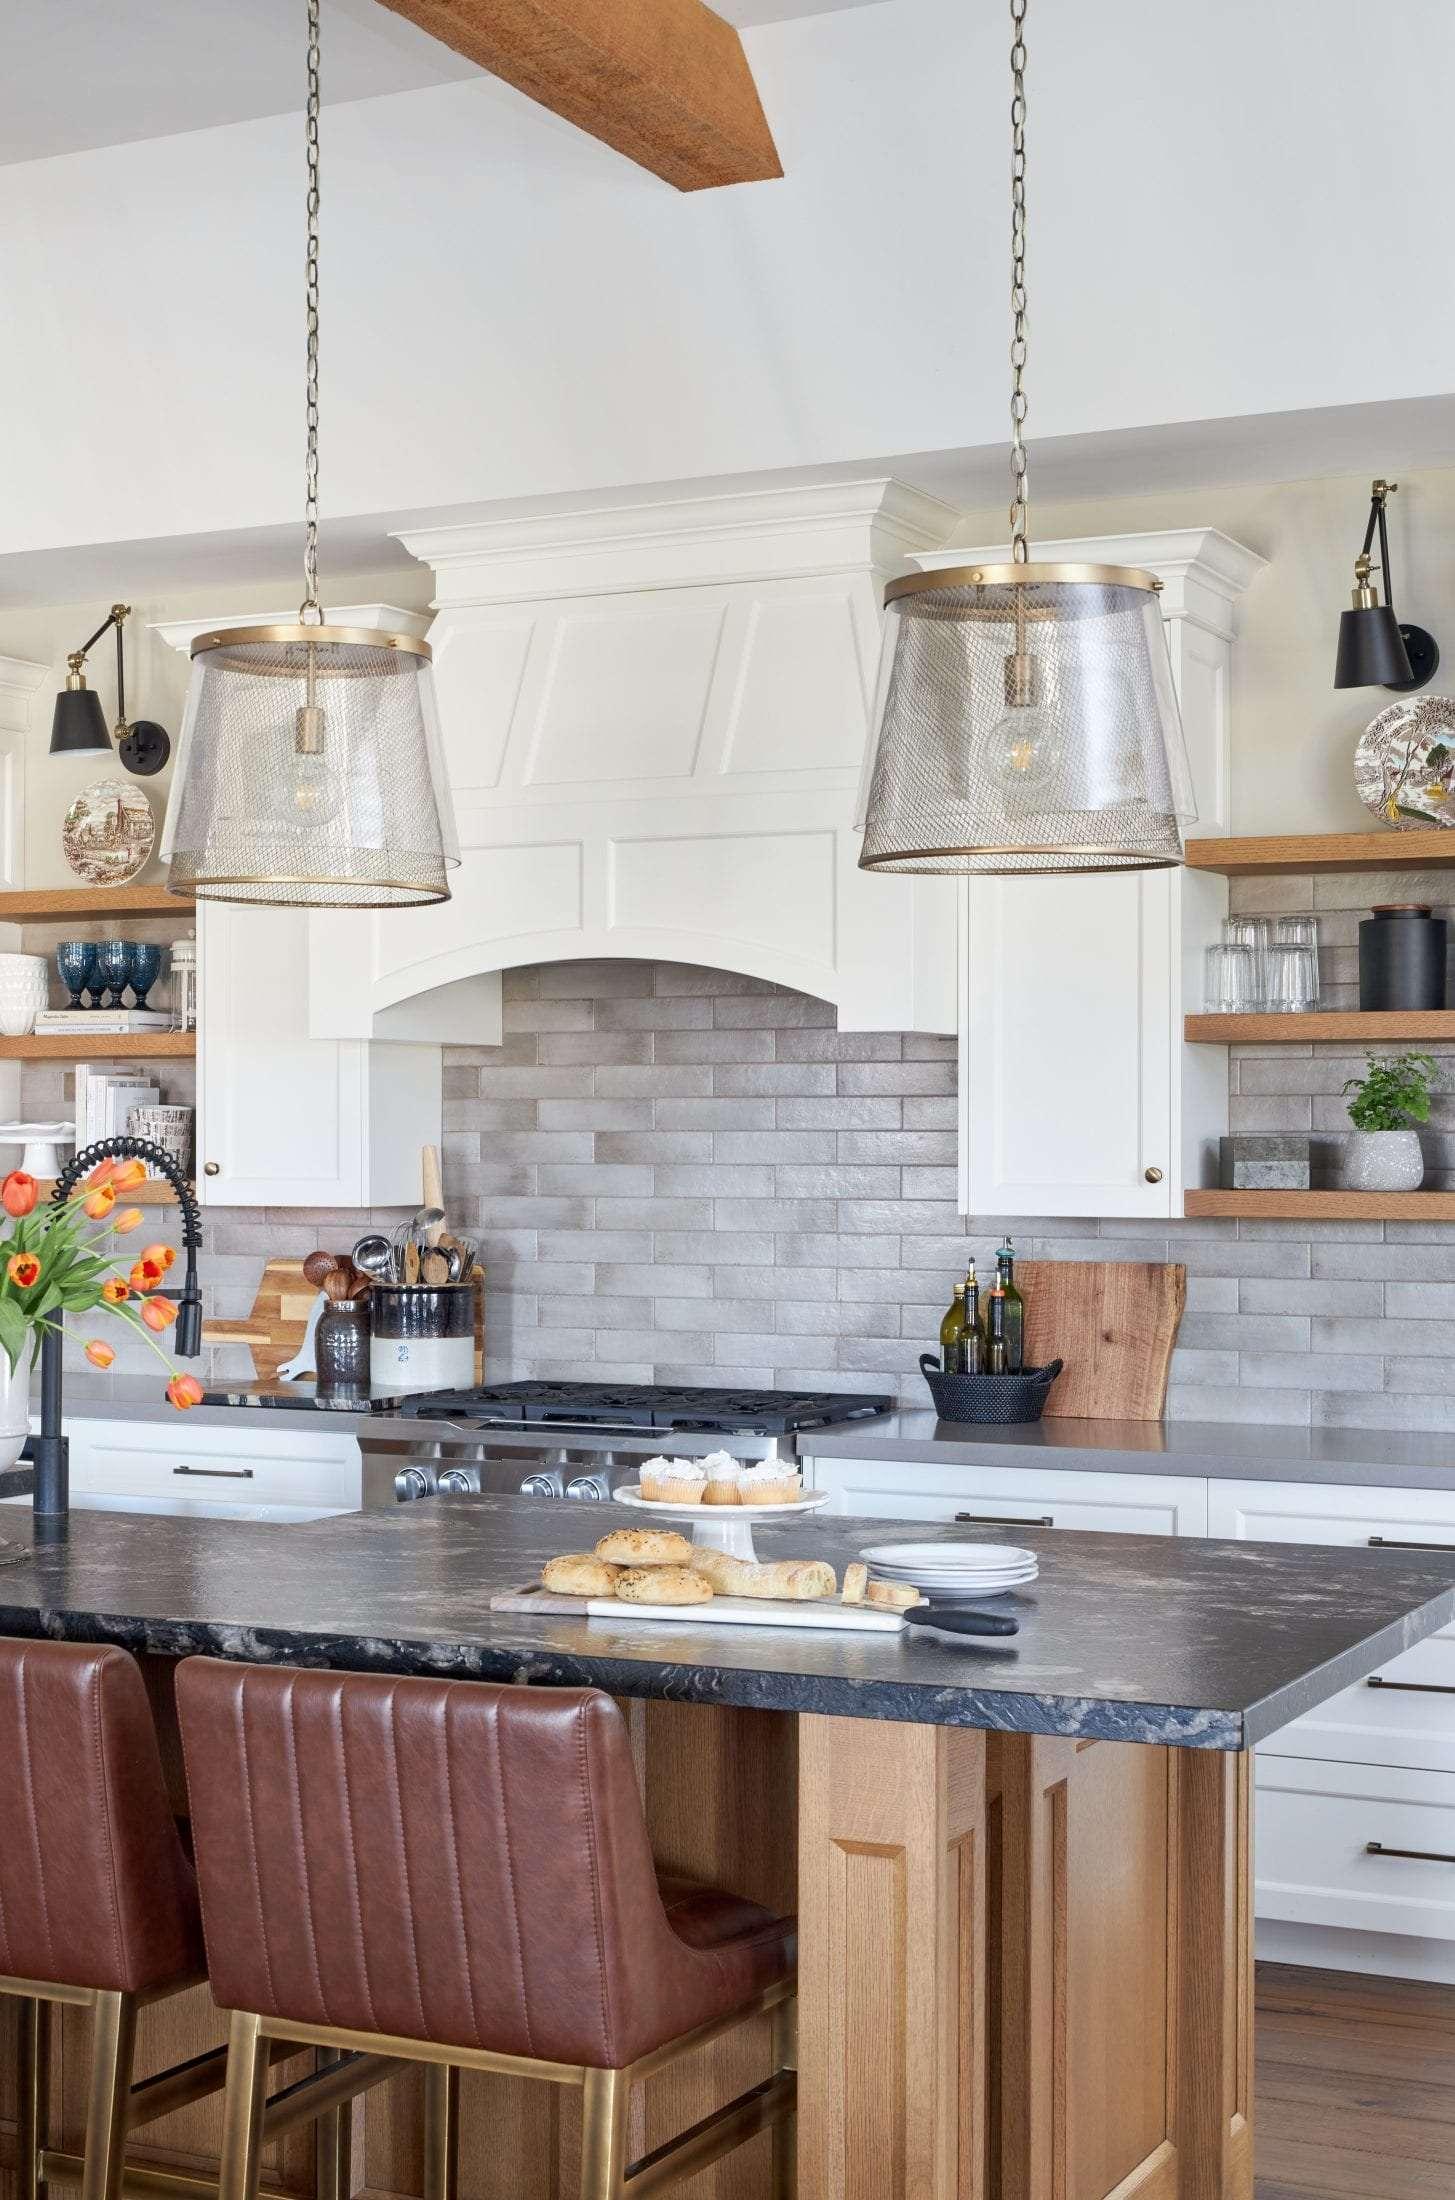 Custom hood fan open wood shelves kitchen leathered granite island